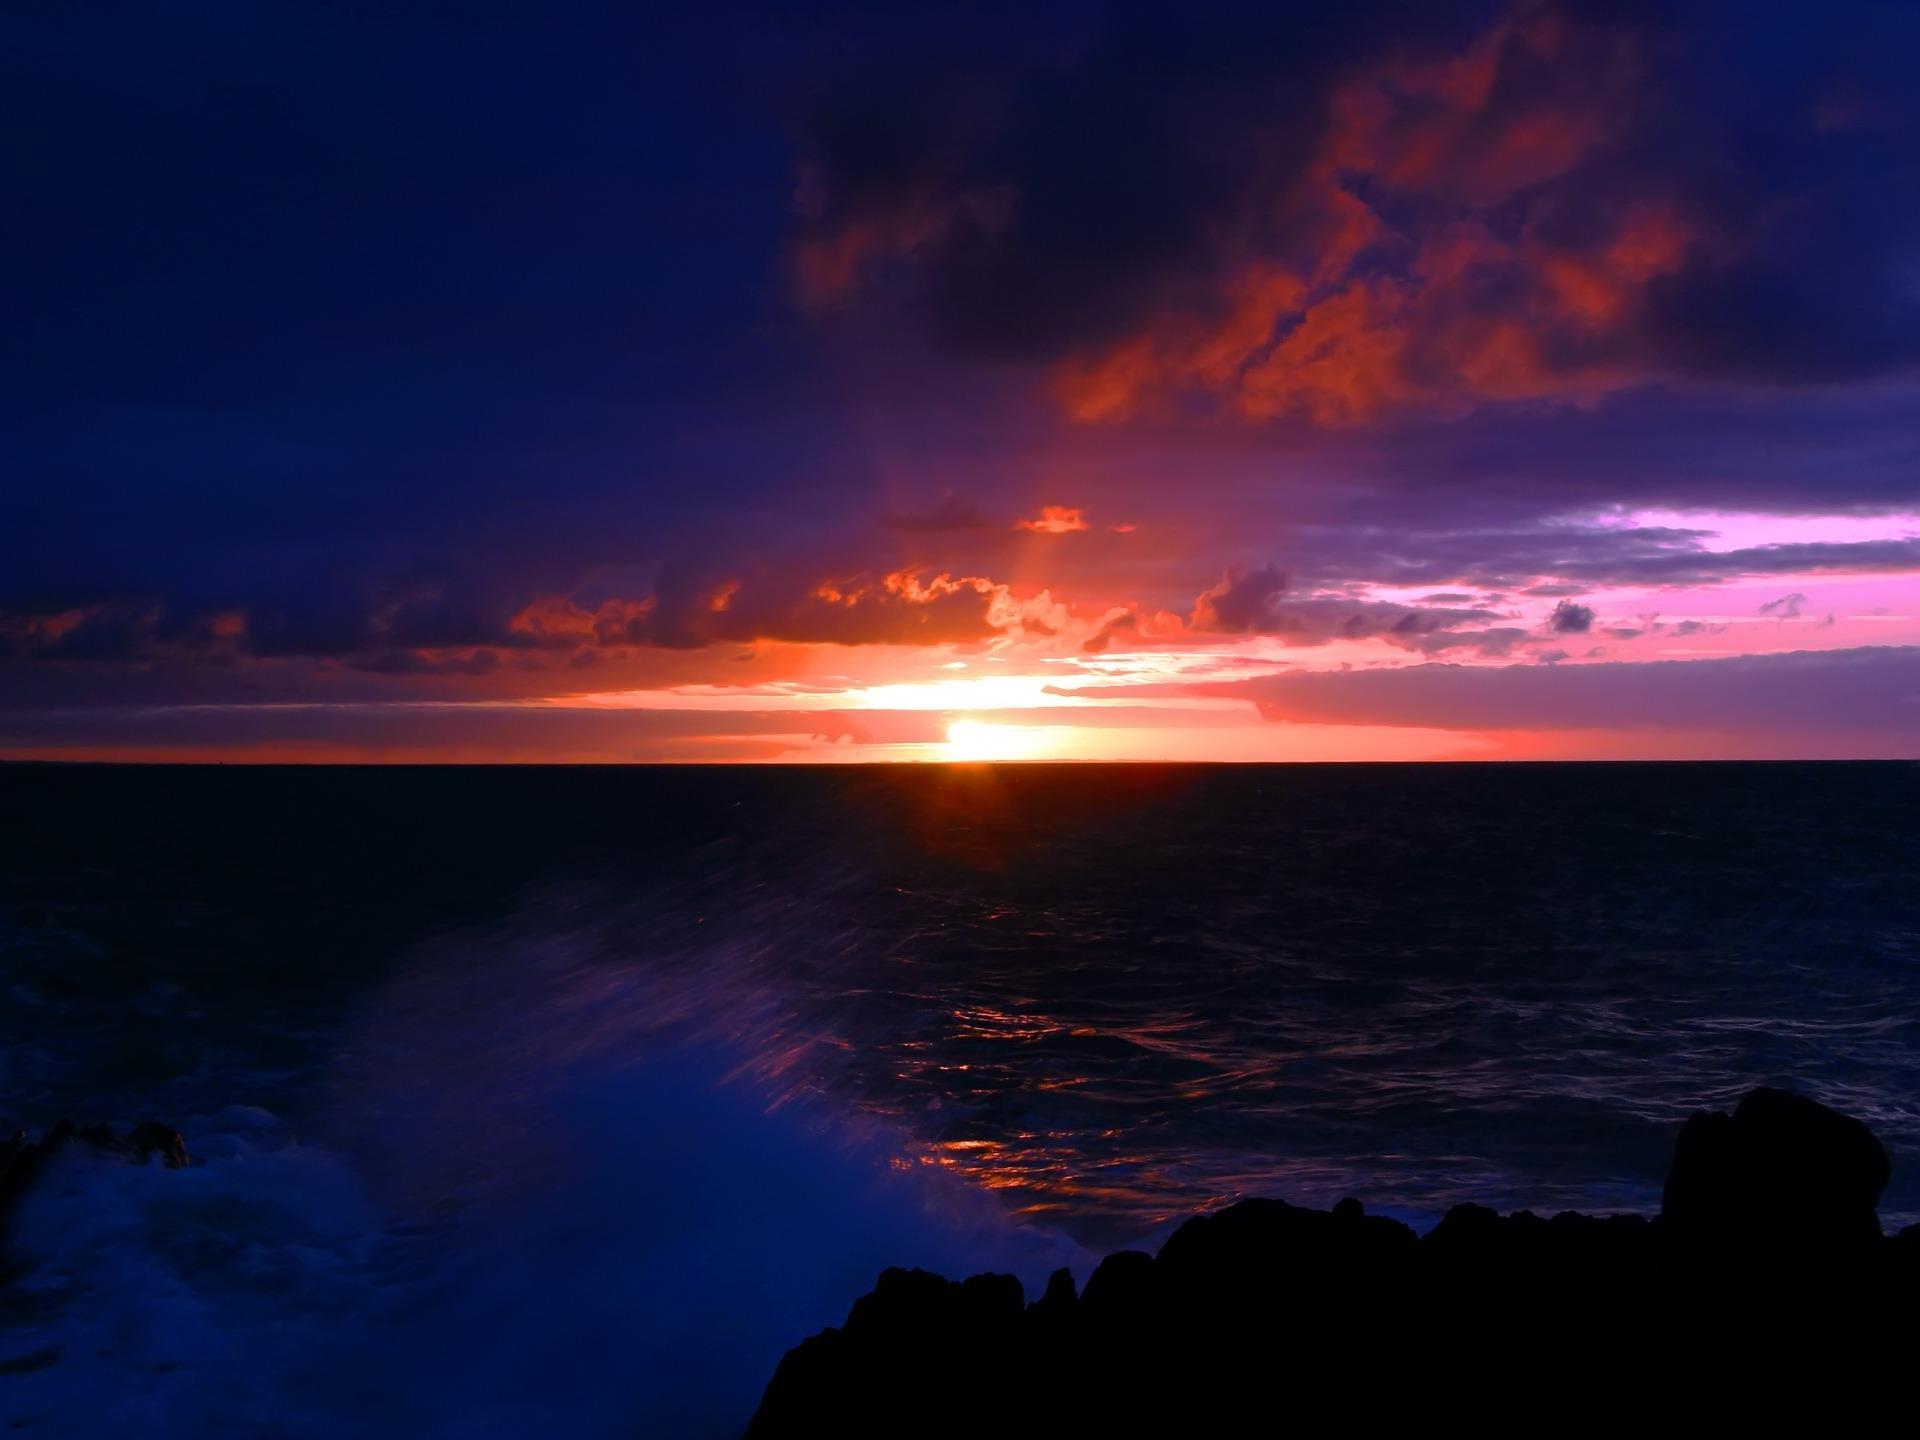 Dark Sea Sunset Wallpaper Landscape Nature Wallpapers